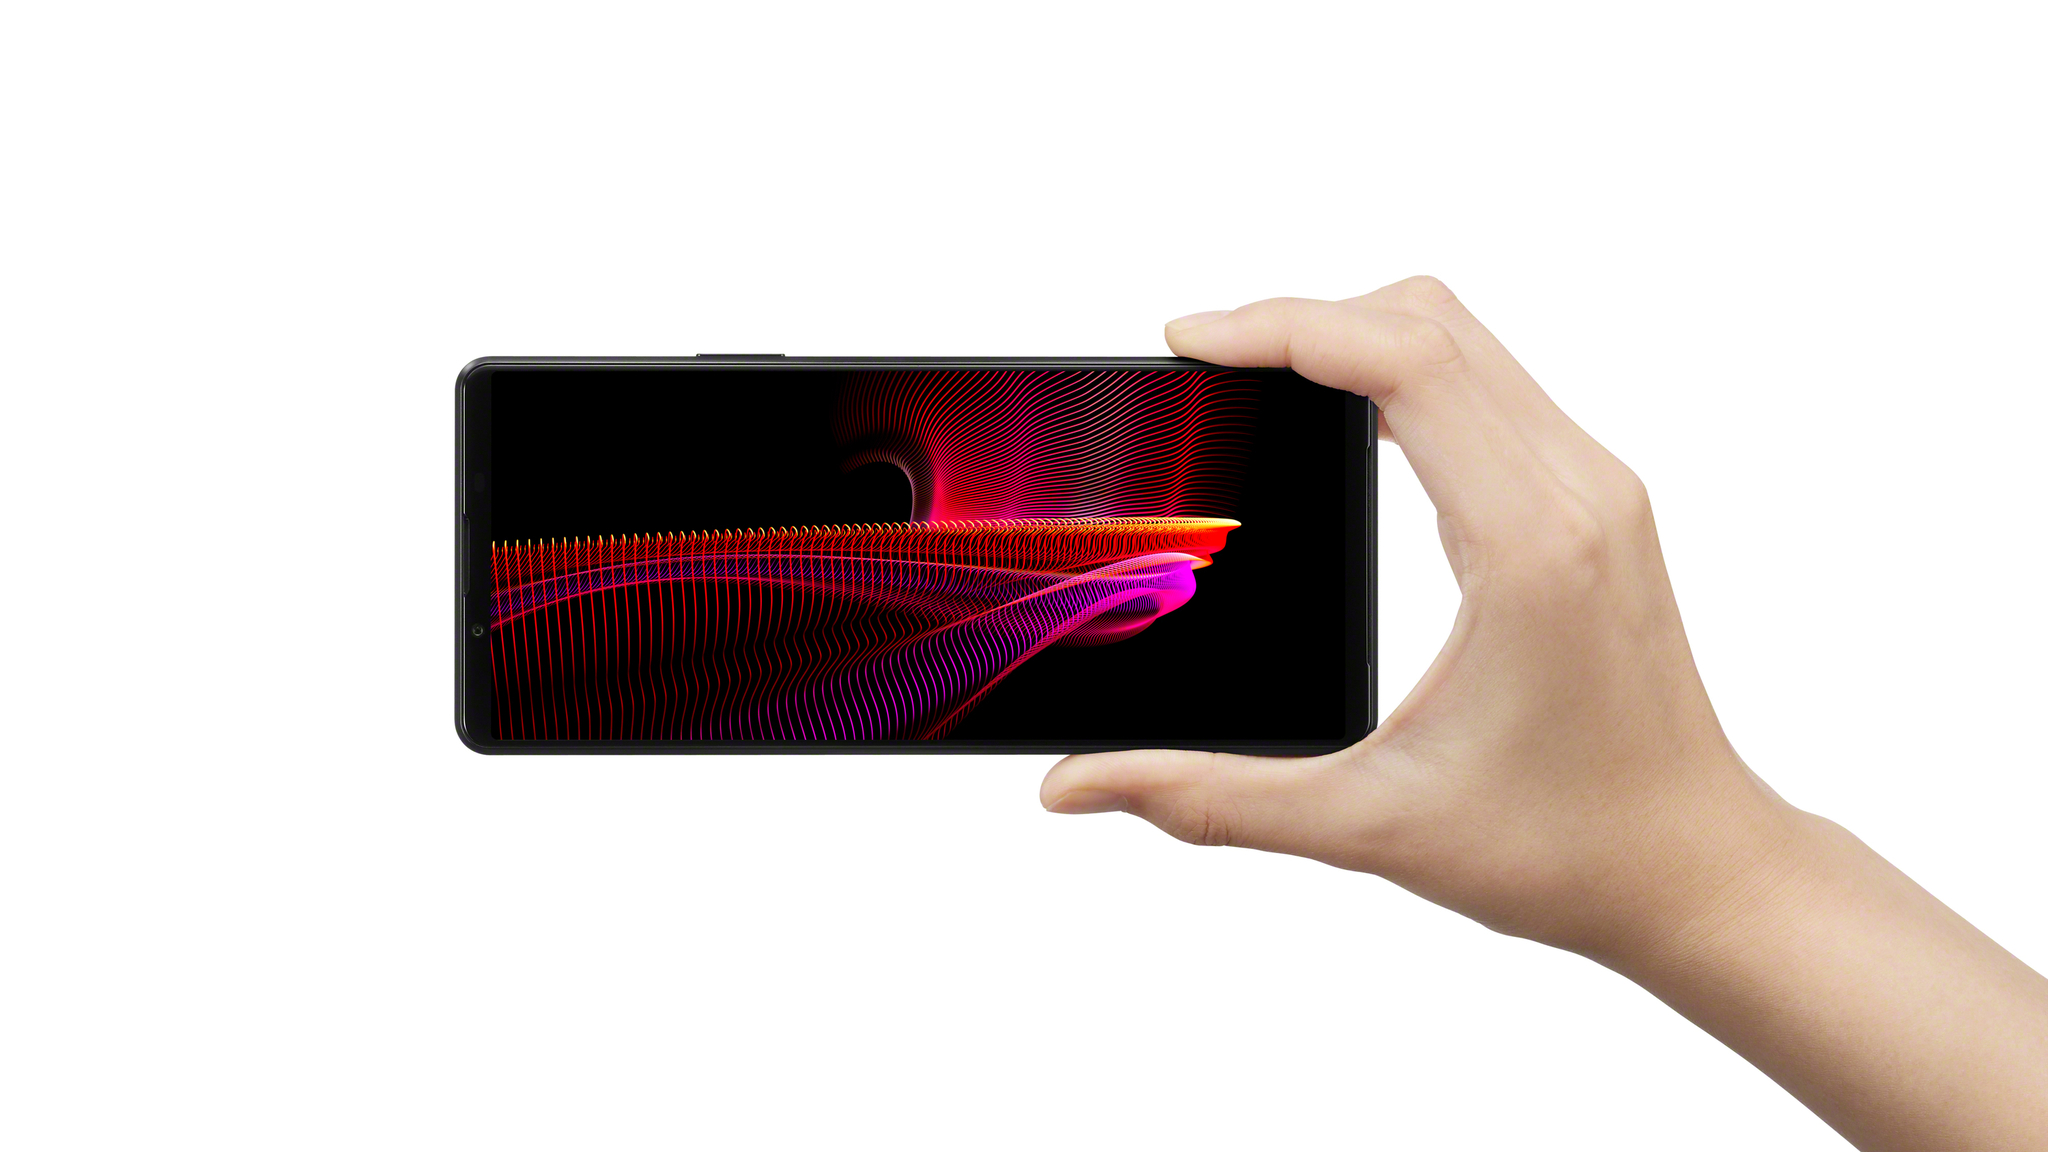 Xperia 1 III это первый смартфон c 4K HDR OLED дисплеем с частотой 120 Гц